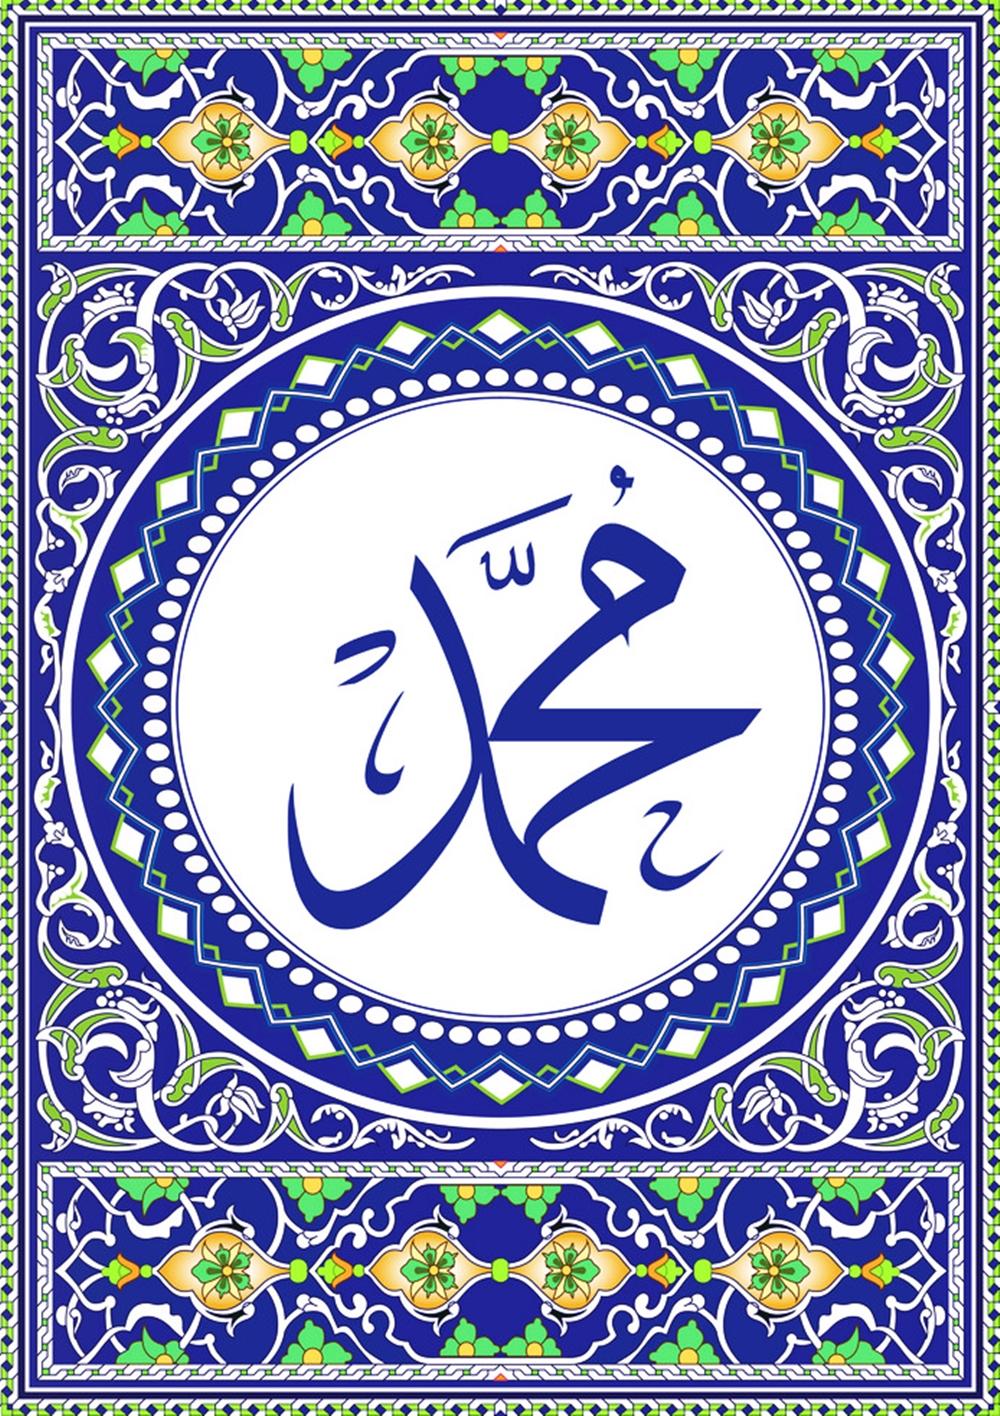 Mencintai Nabi Muhammad dengan Sederhana